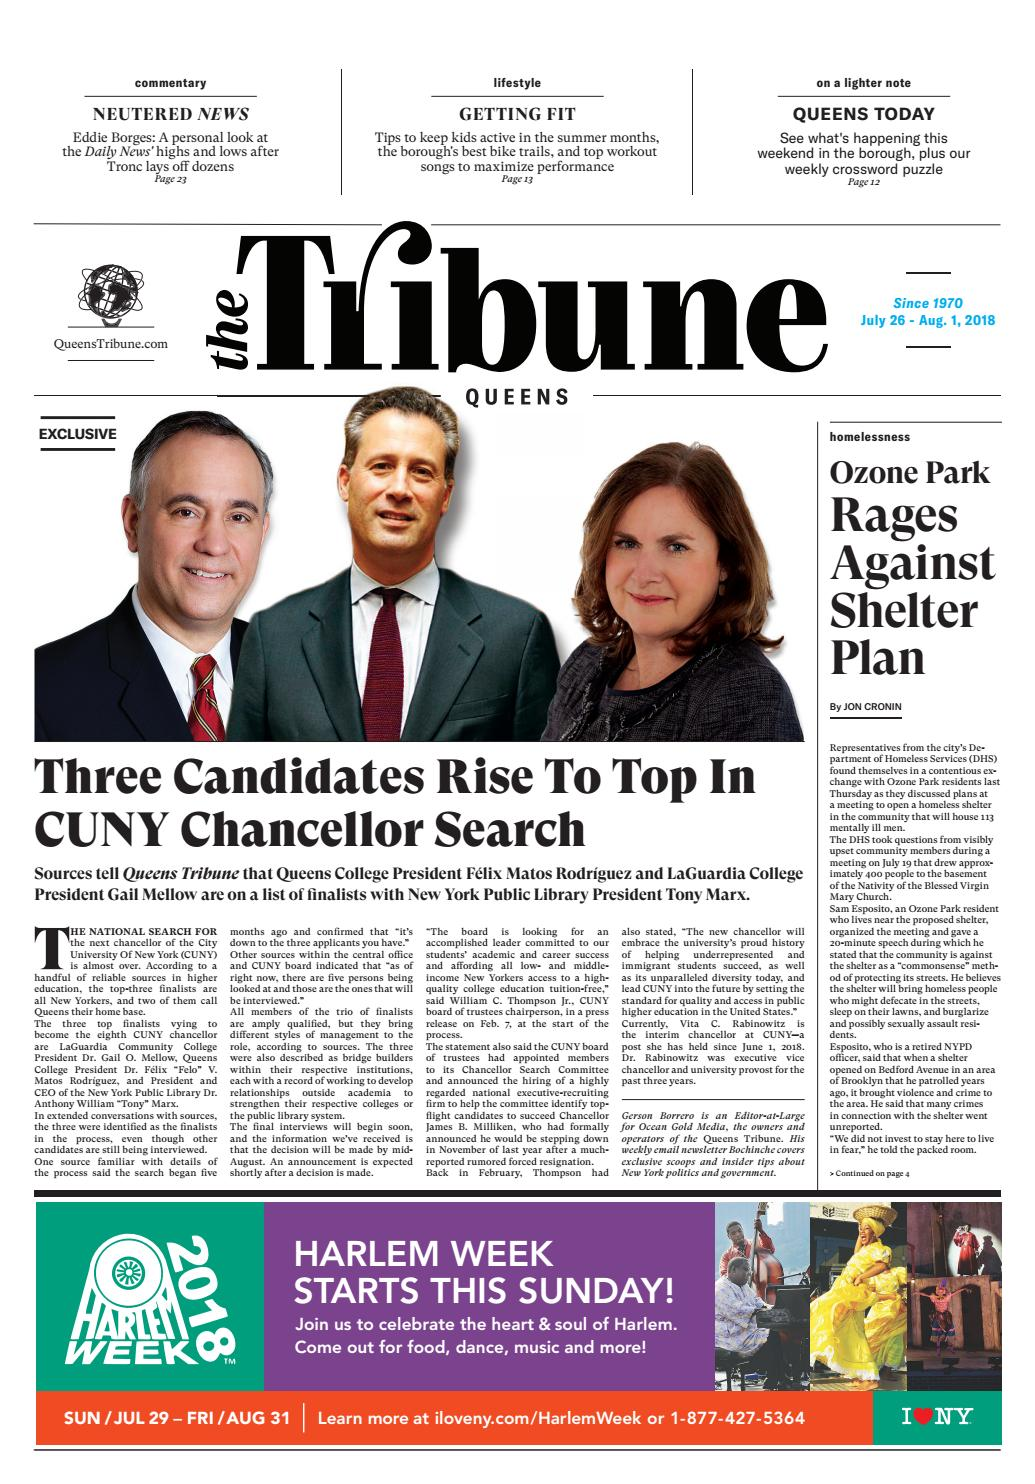 Queens Tribune 07 26 2018 by The Queens Tribune - issuu